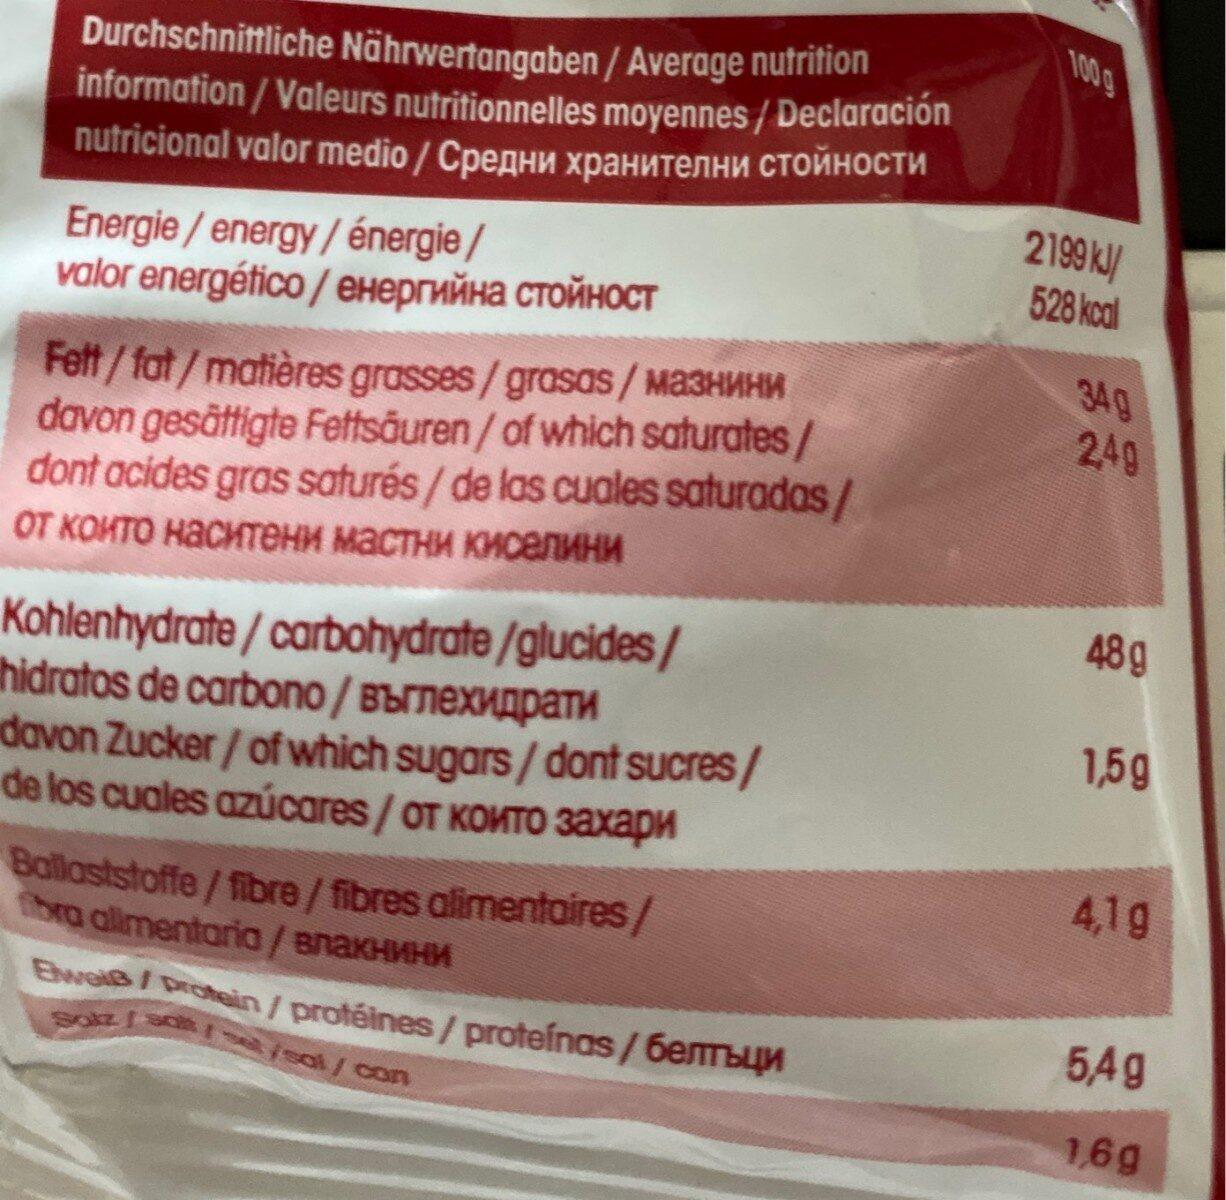 Crunchips - Nutrition facts - fr